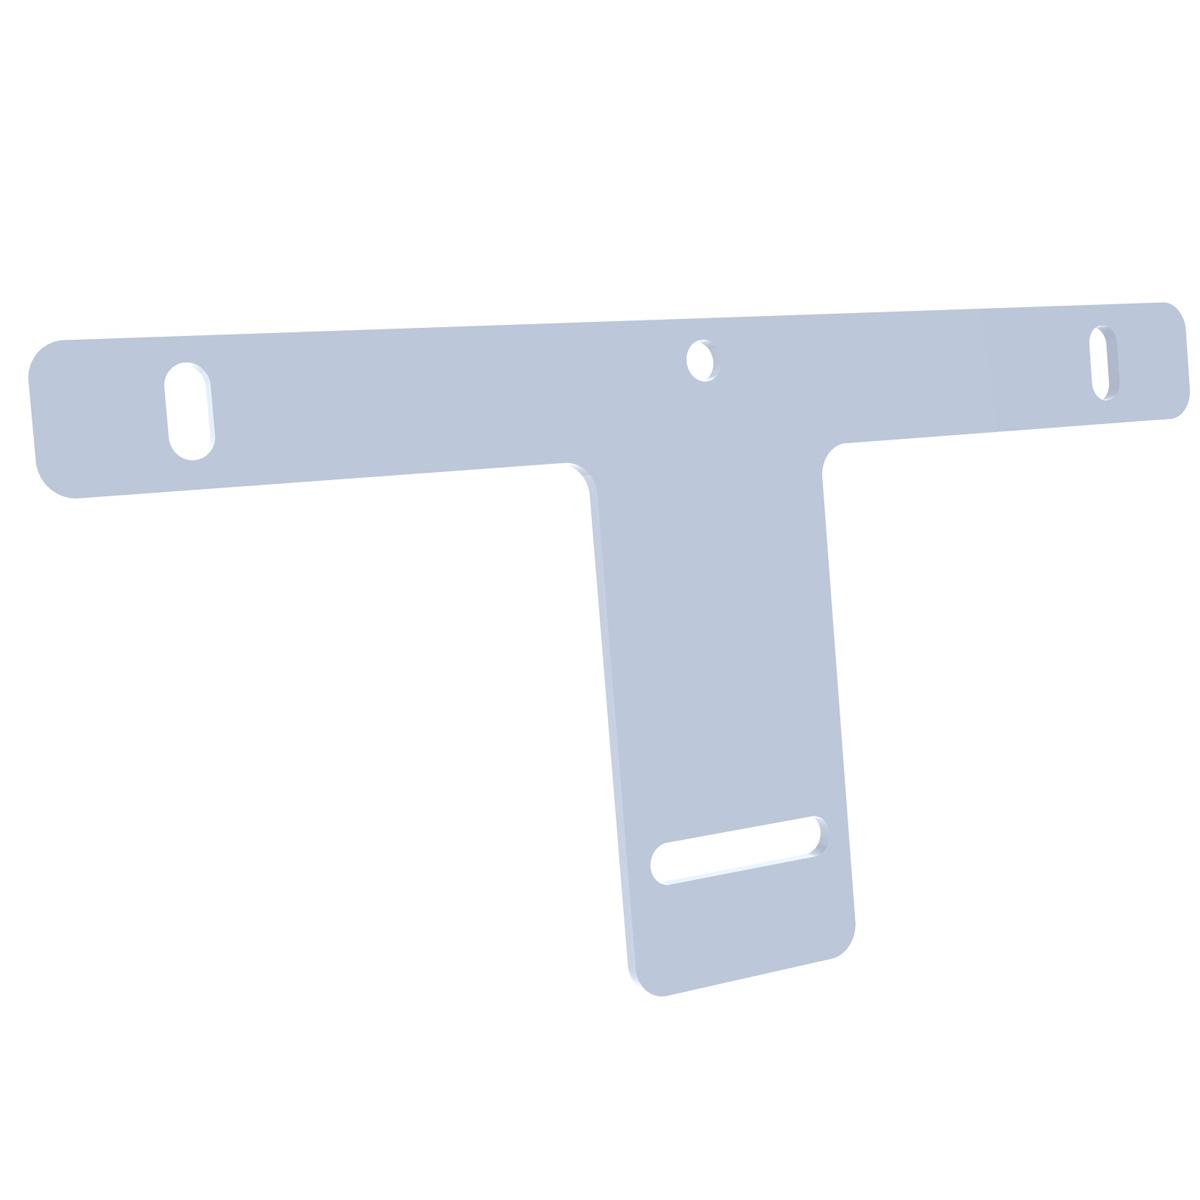 Terrain Surface Connector Plates